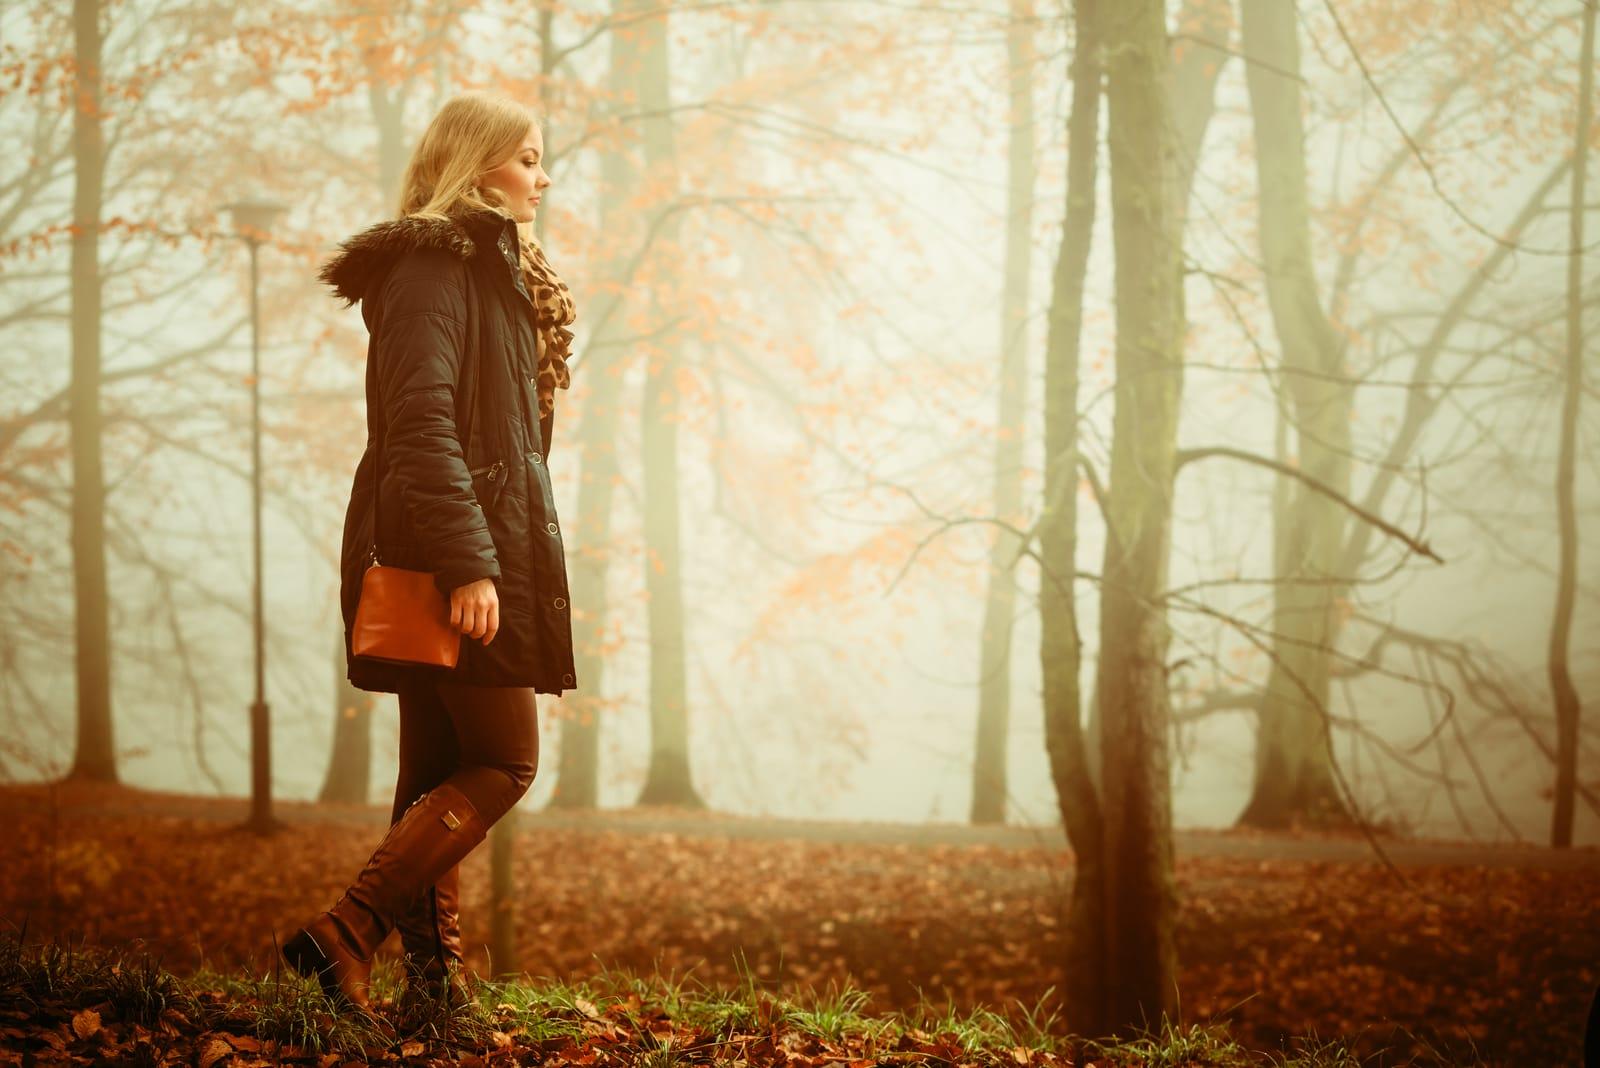 lonely woman walking in park